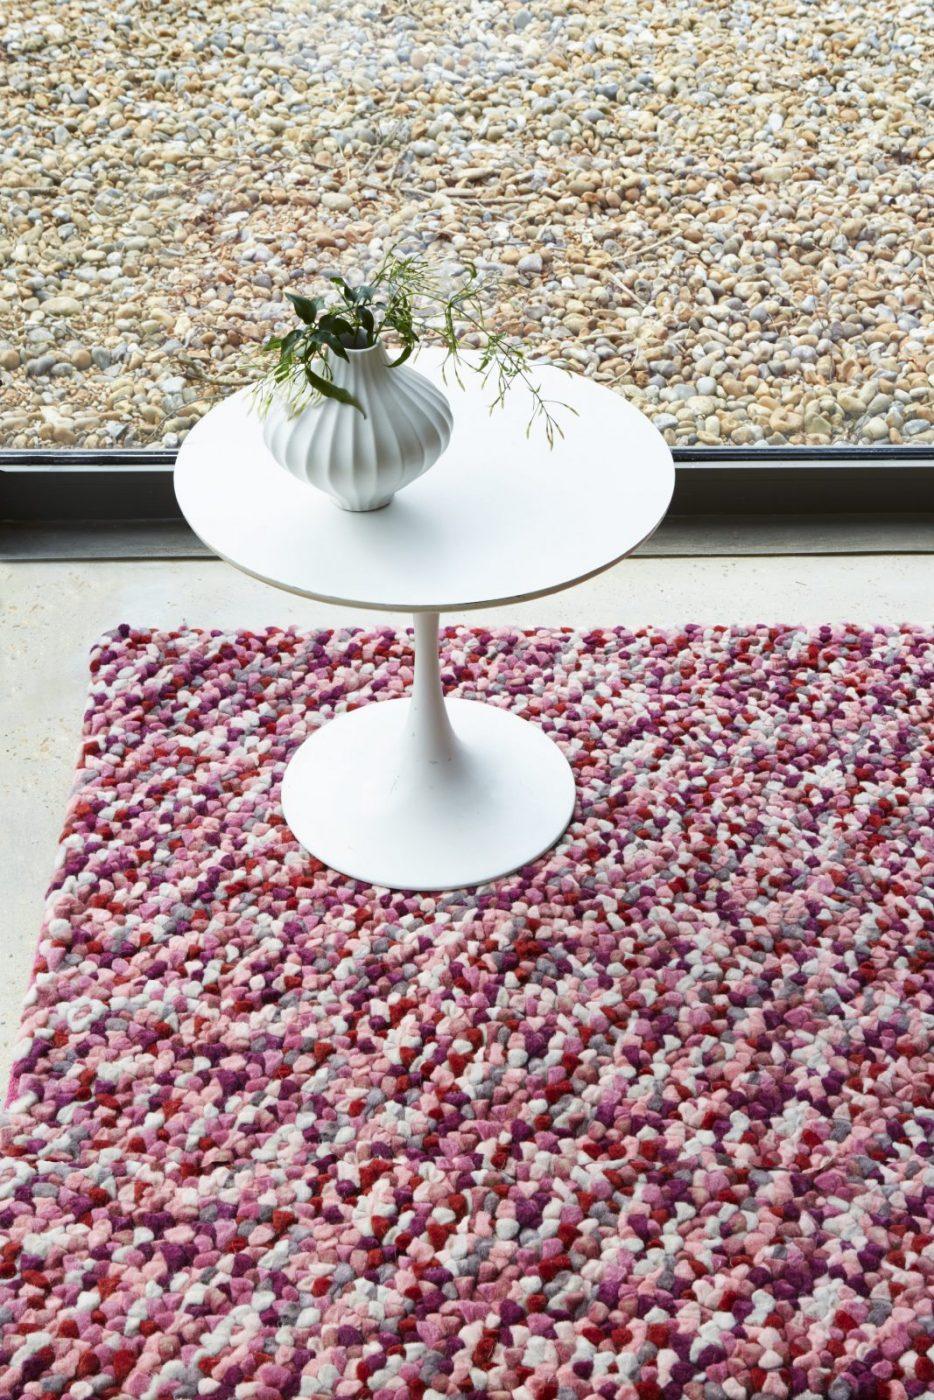 Beans BEA04 | Plantation Rug Company | Best at Flooring